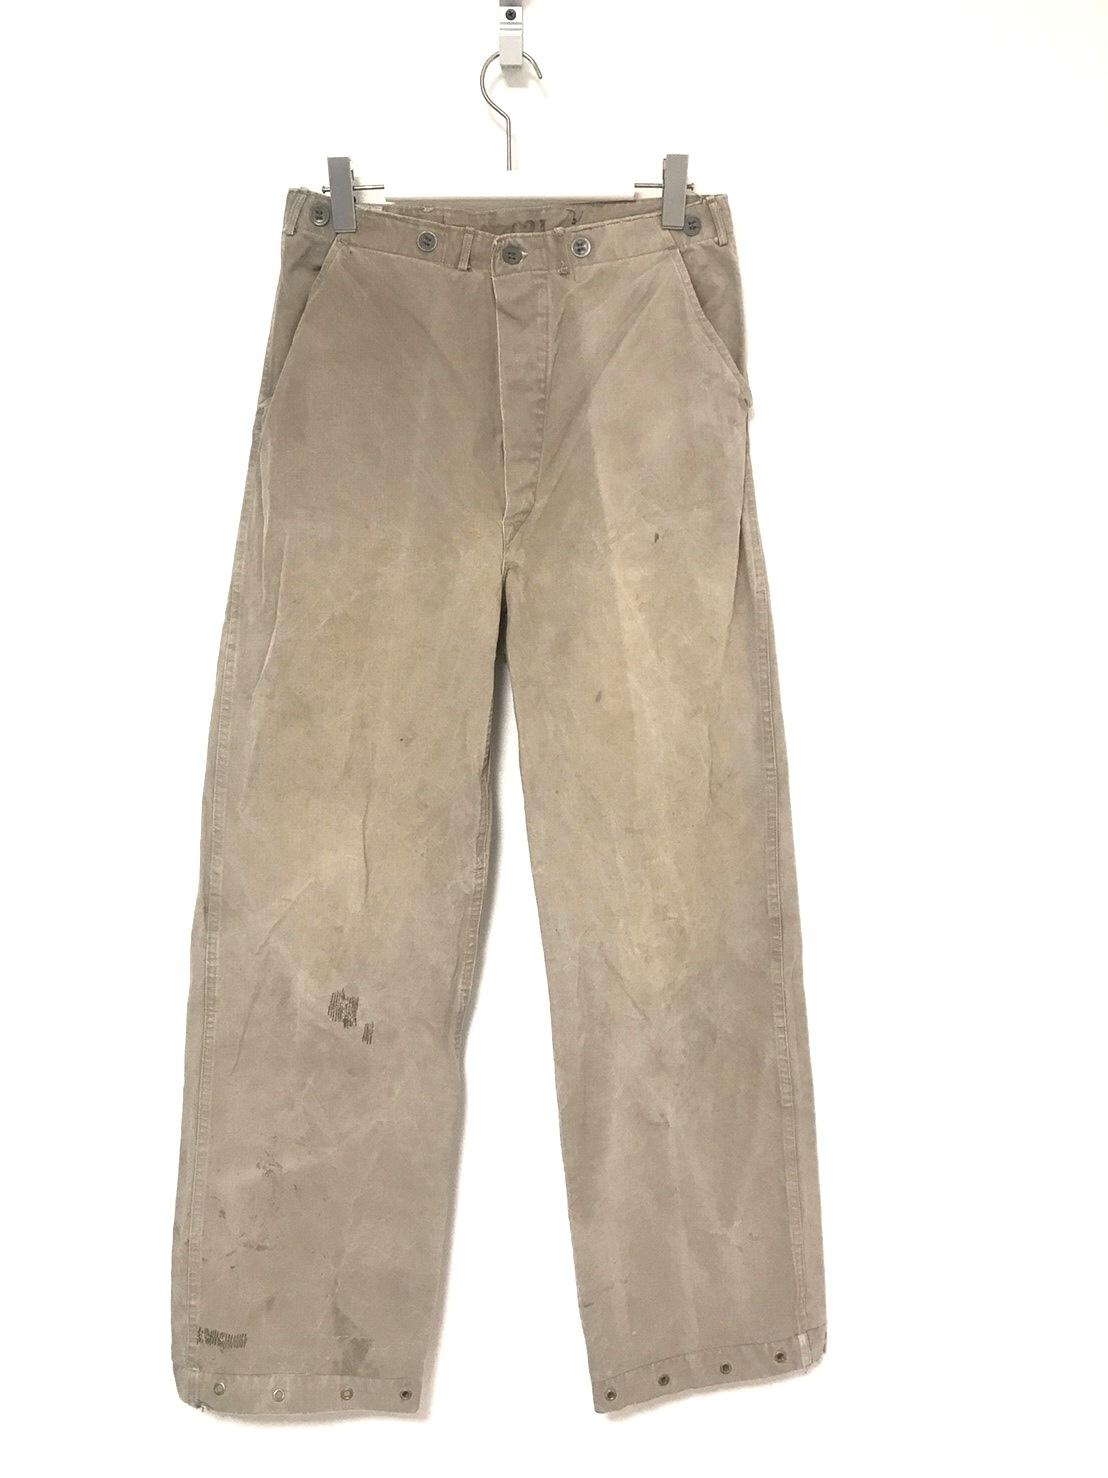 ⑤ 40's Swedish Army M-39 Work Pants